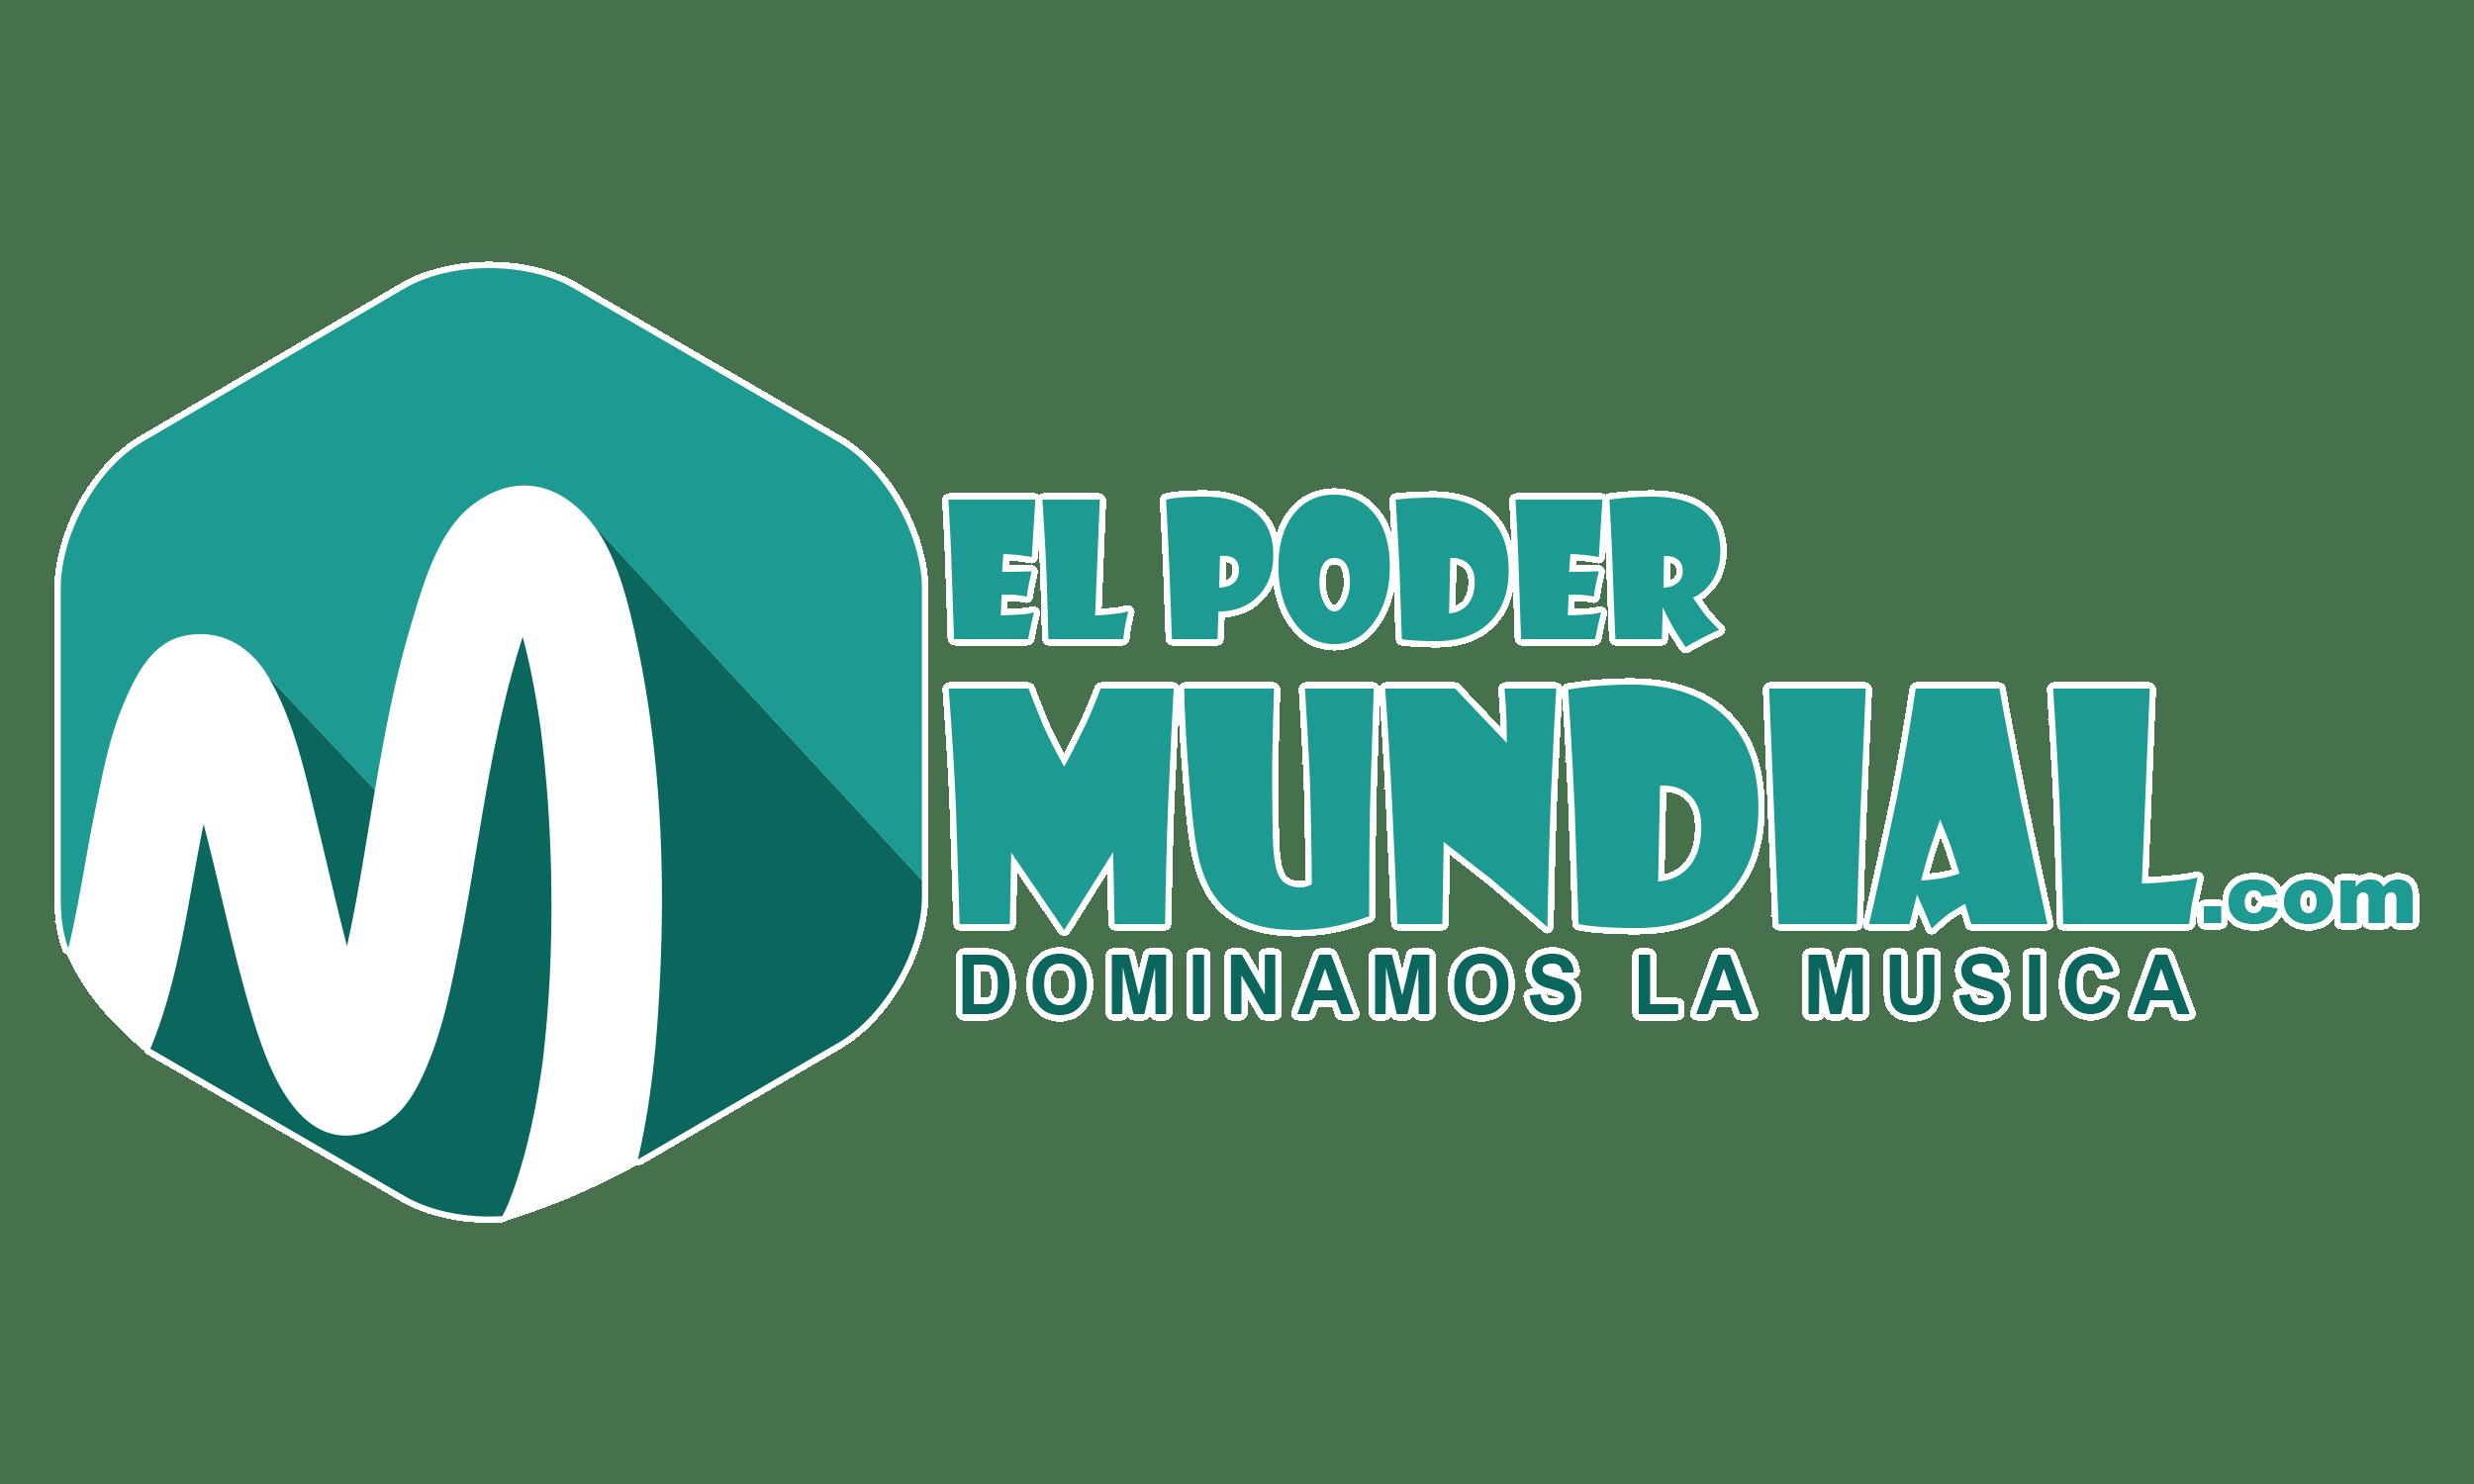 EL PODER MUNDIAL